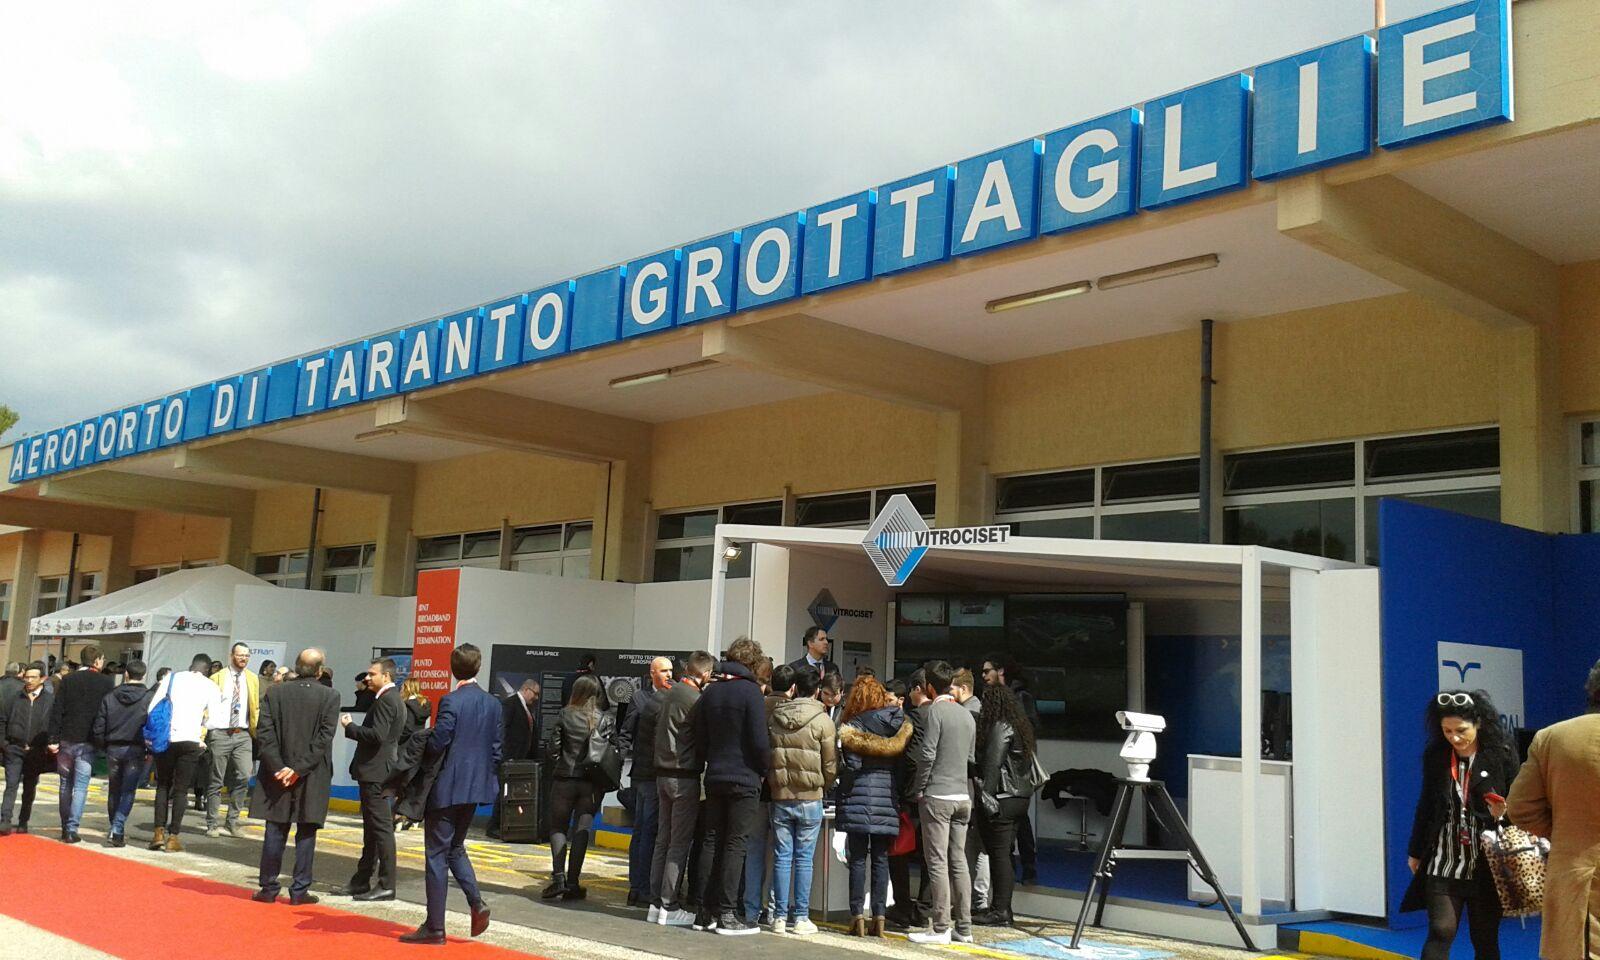 Aeroporto Grottaglie DTA Puglia